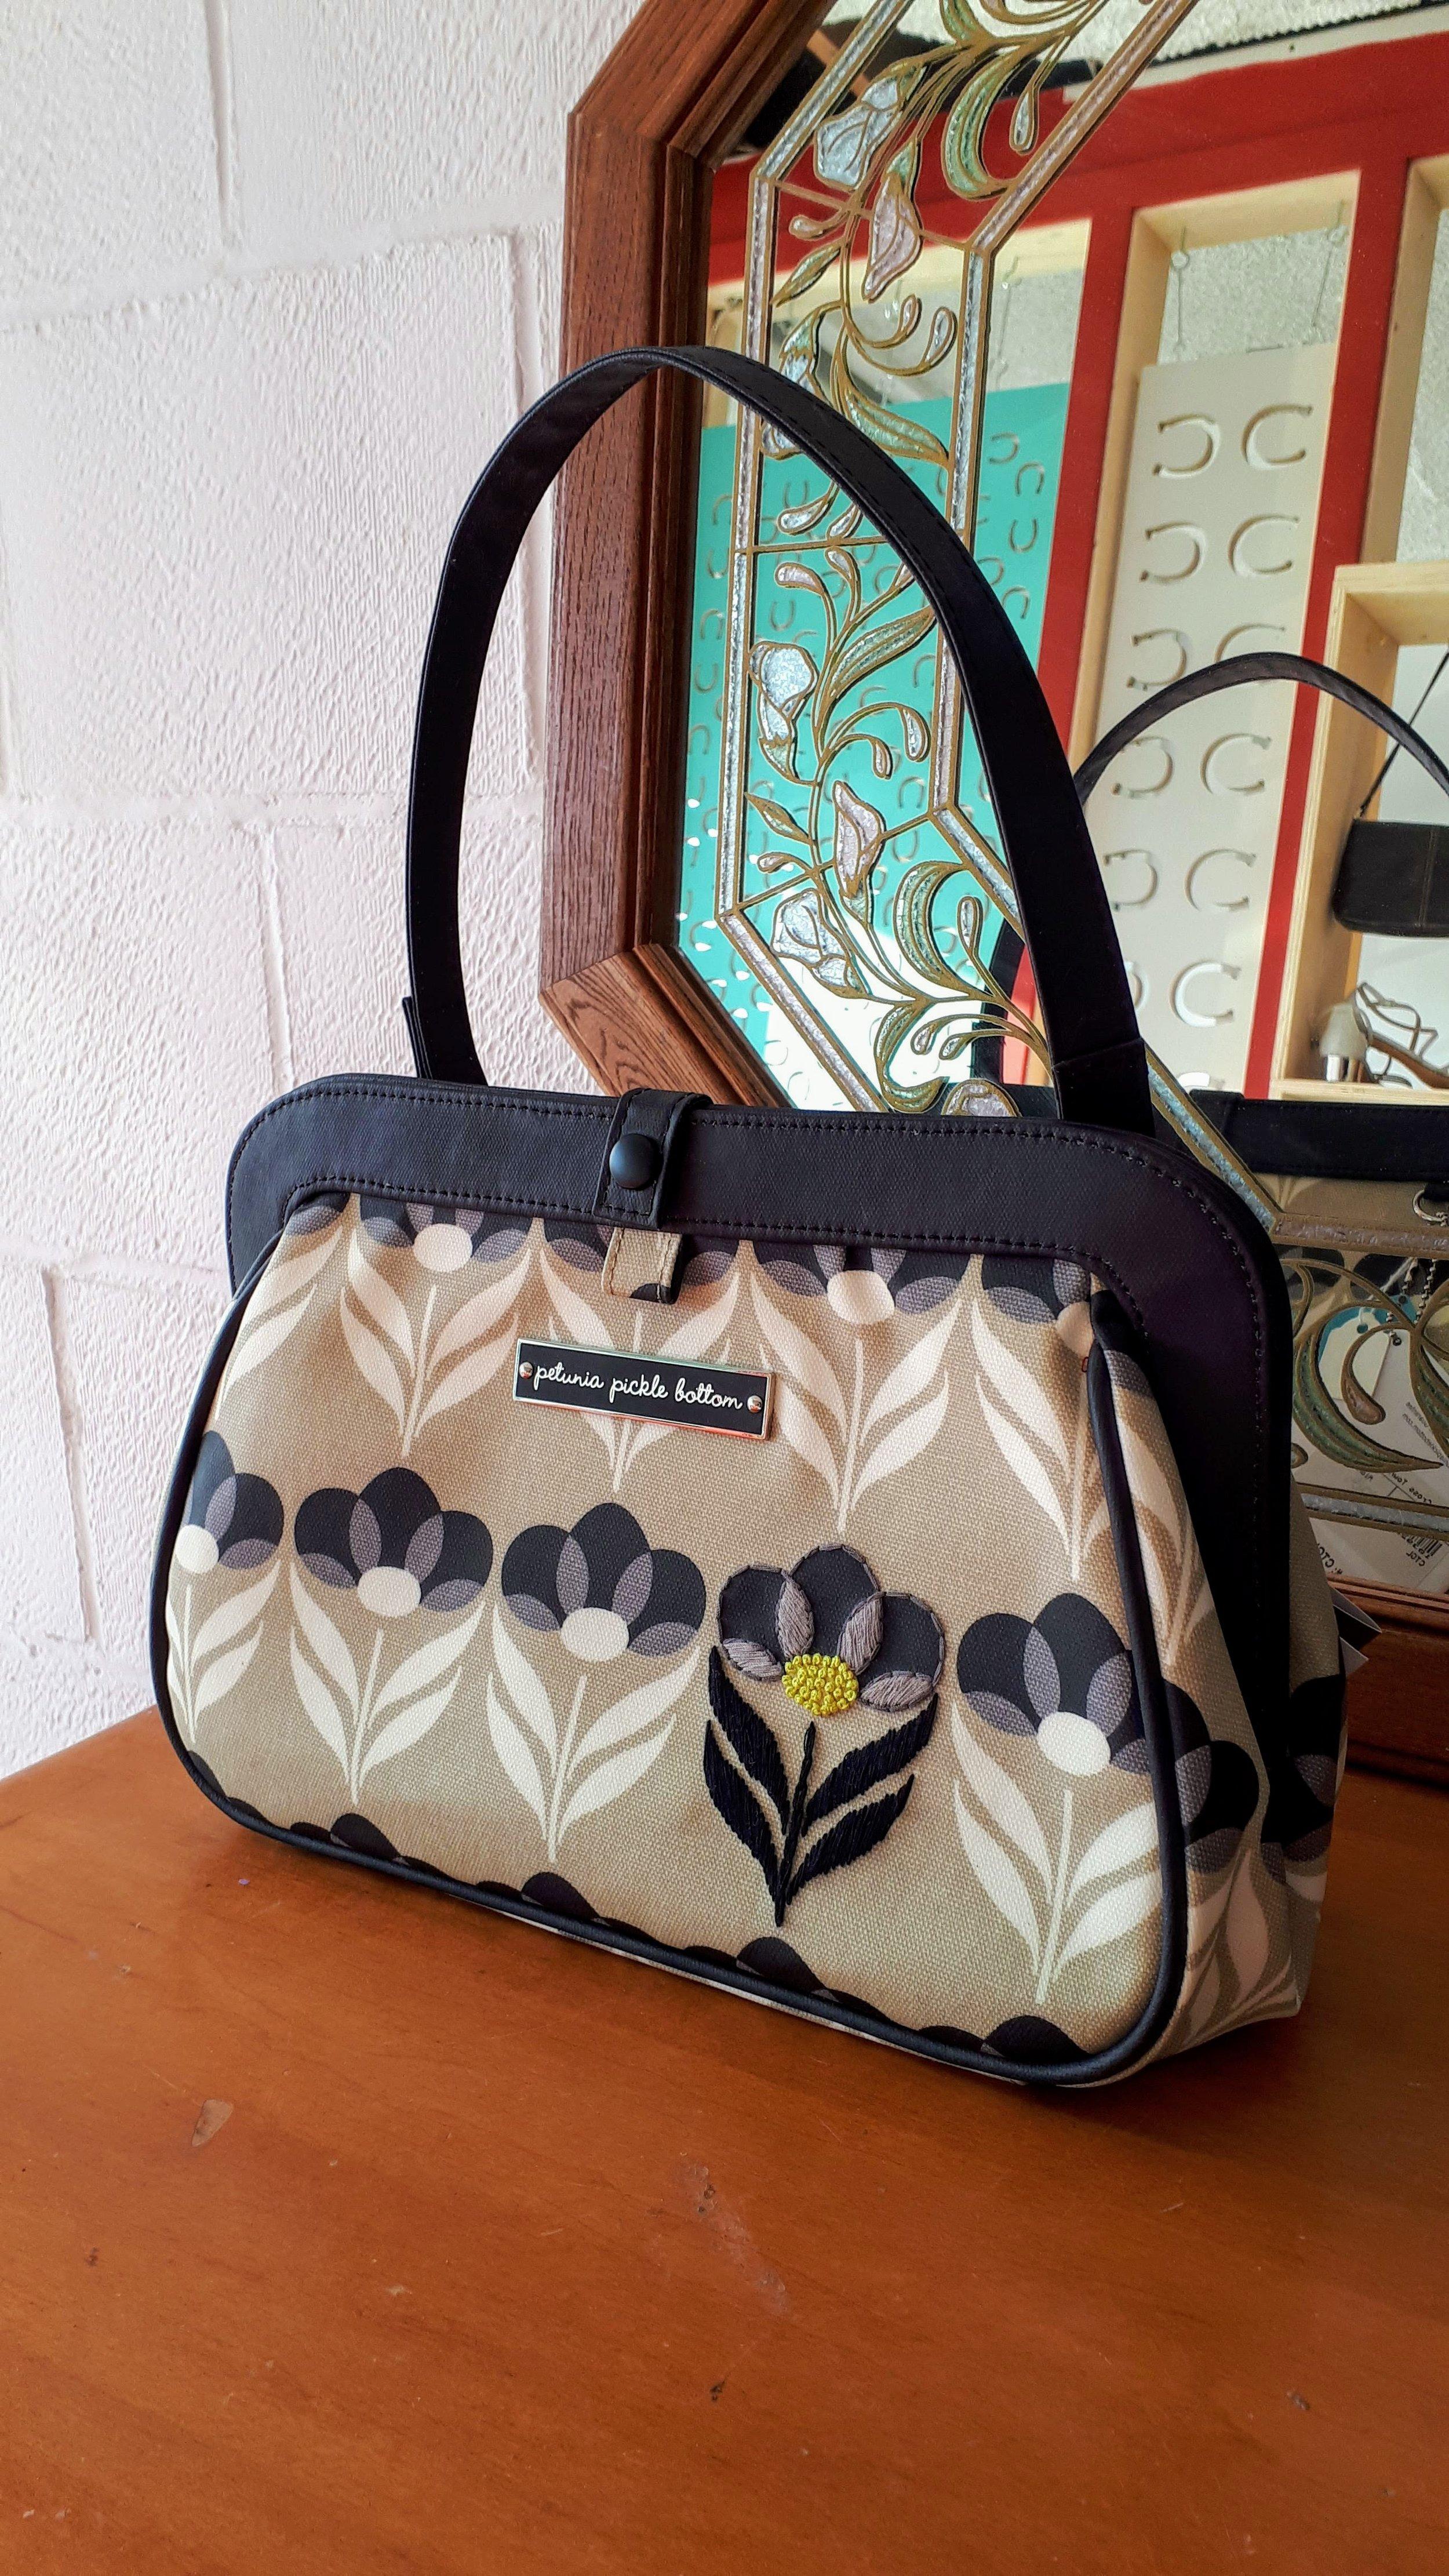 Petunia Picklebottom purse (NWT), $45